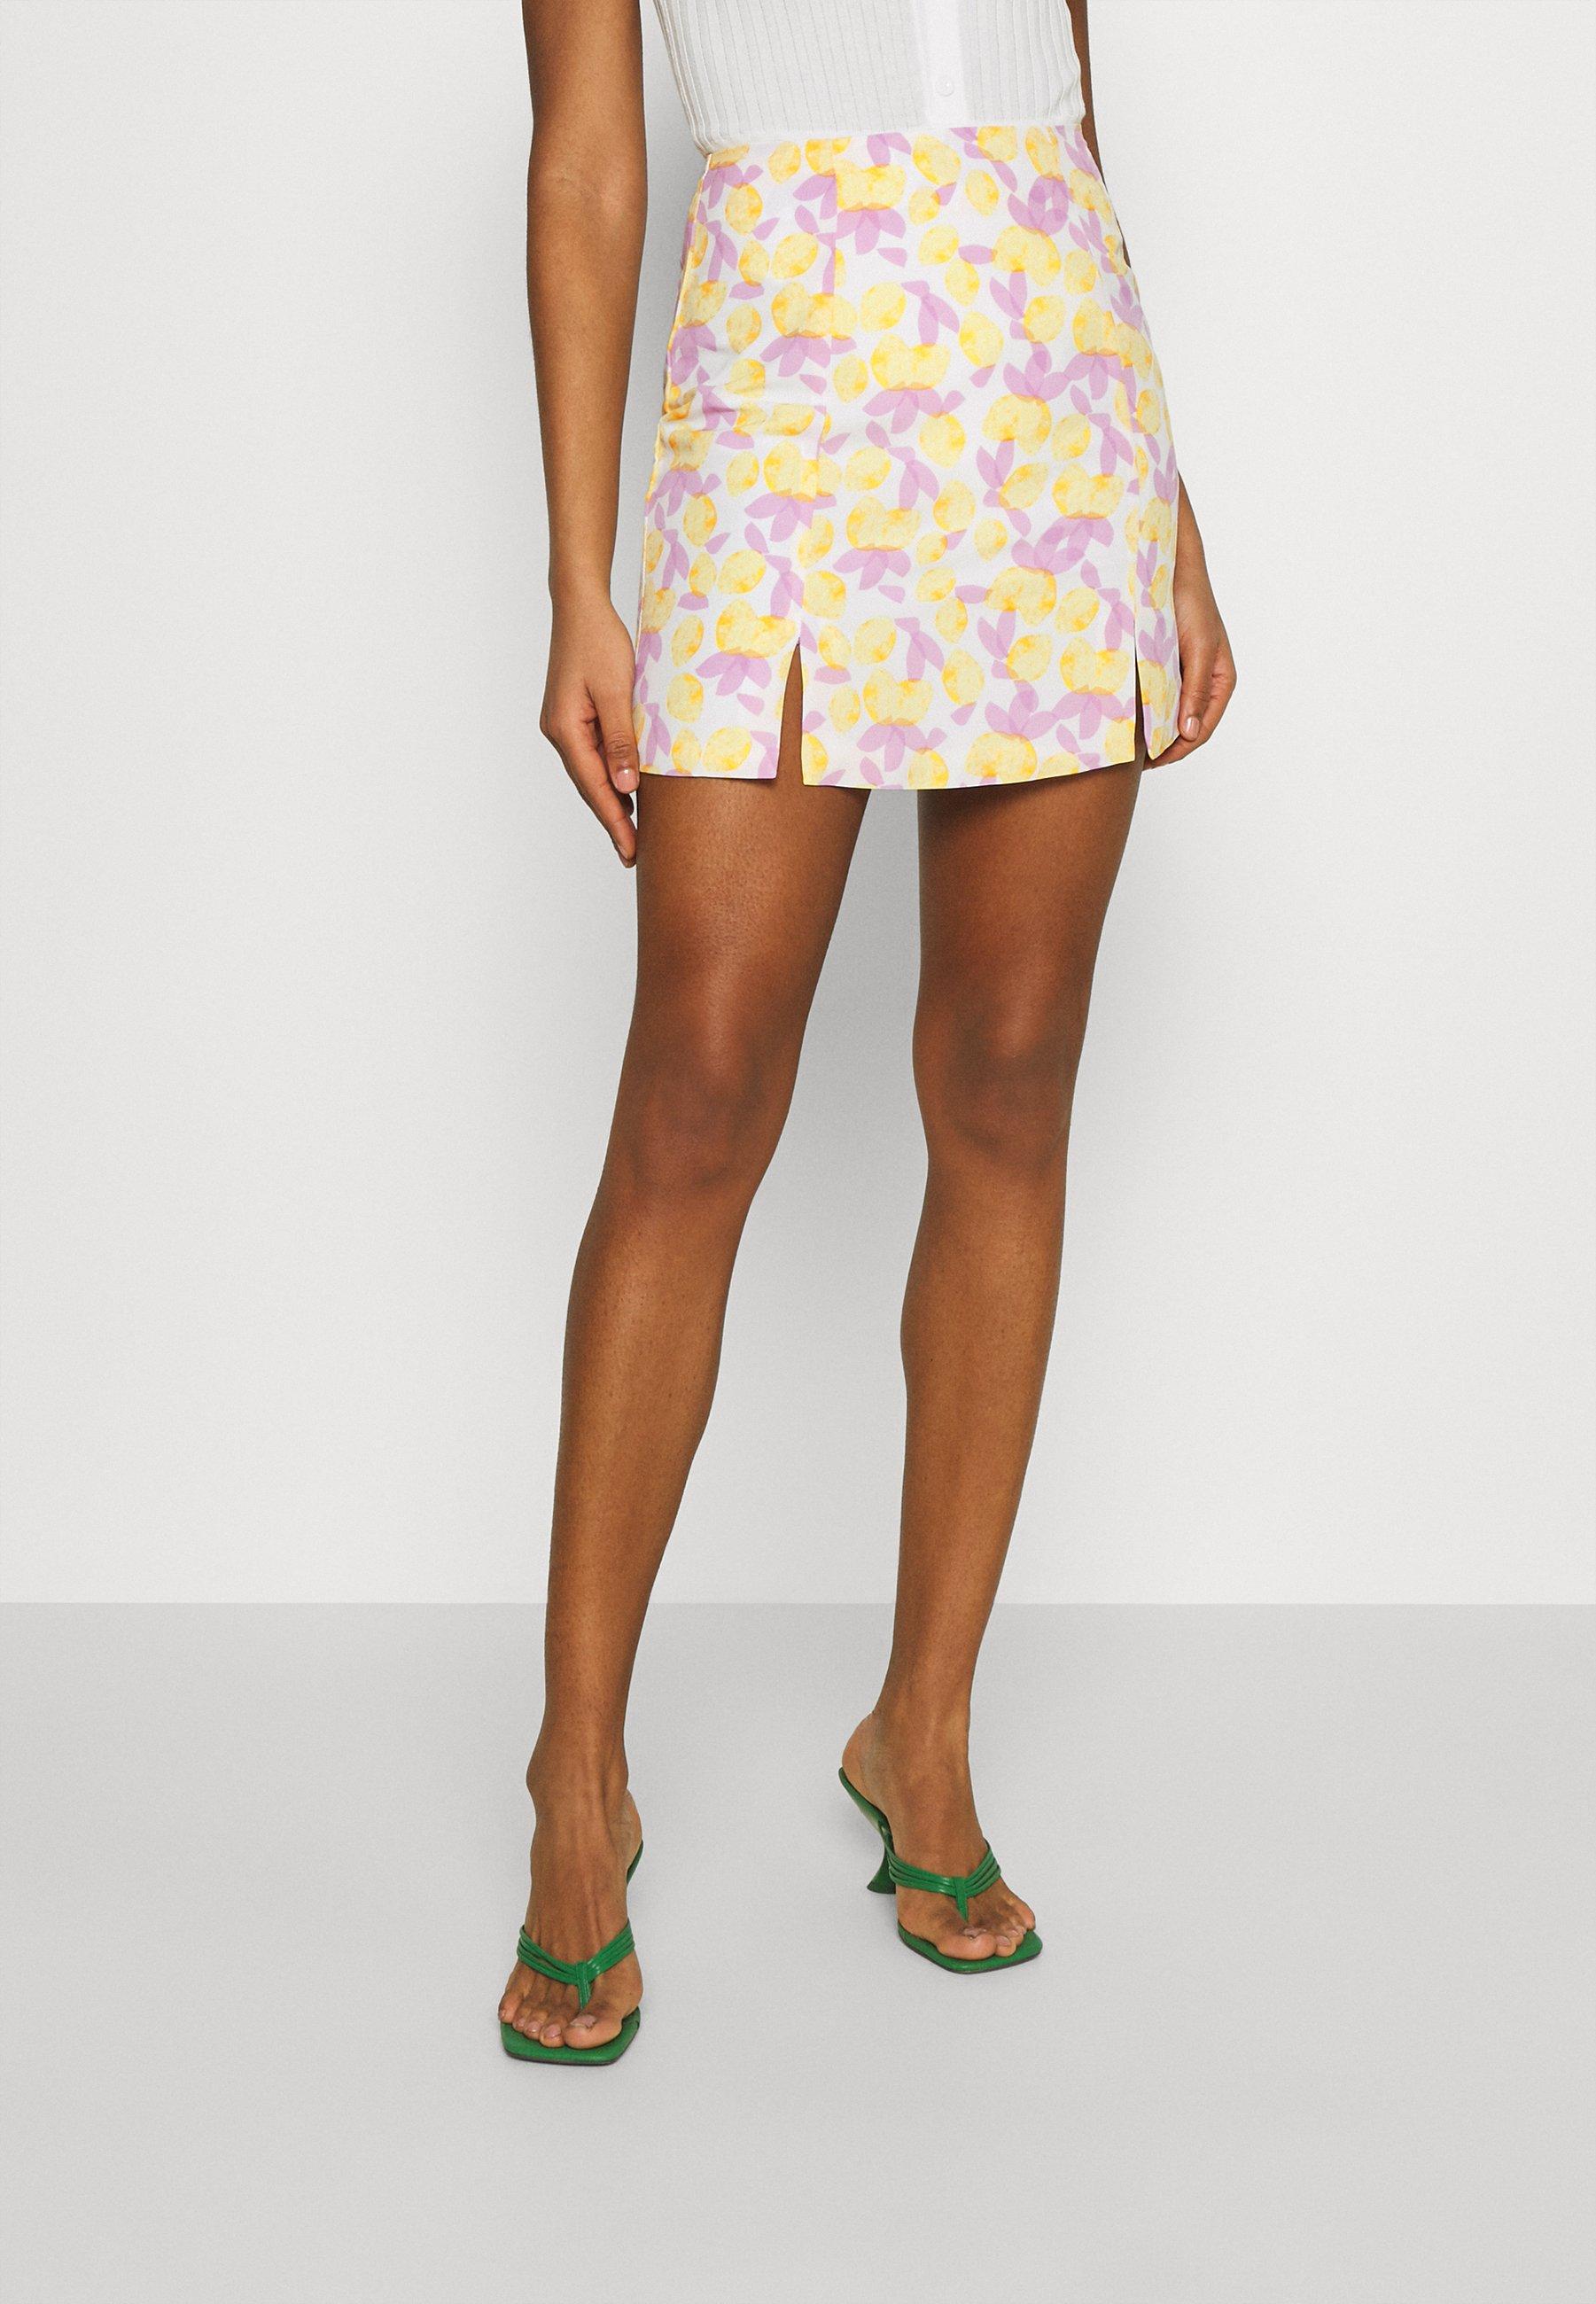 Women MAYA HIGH-WAISTED SKIRT WITH FRONT SIDE SPLITS - Mini skirt - lemon/lilac